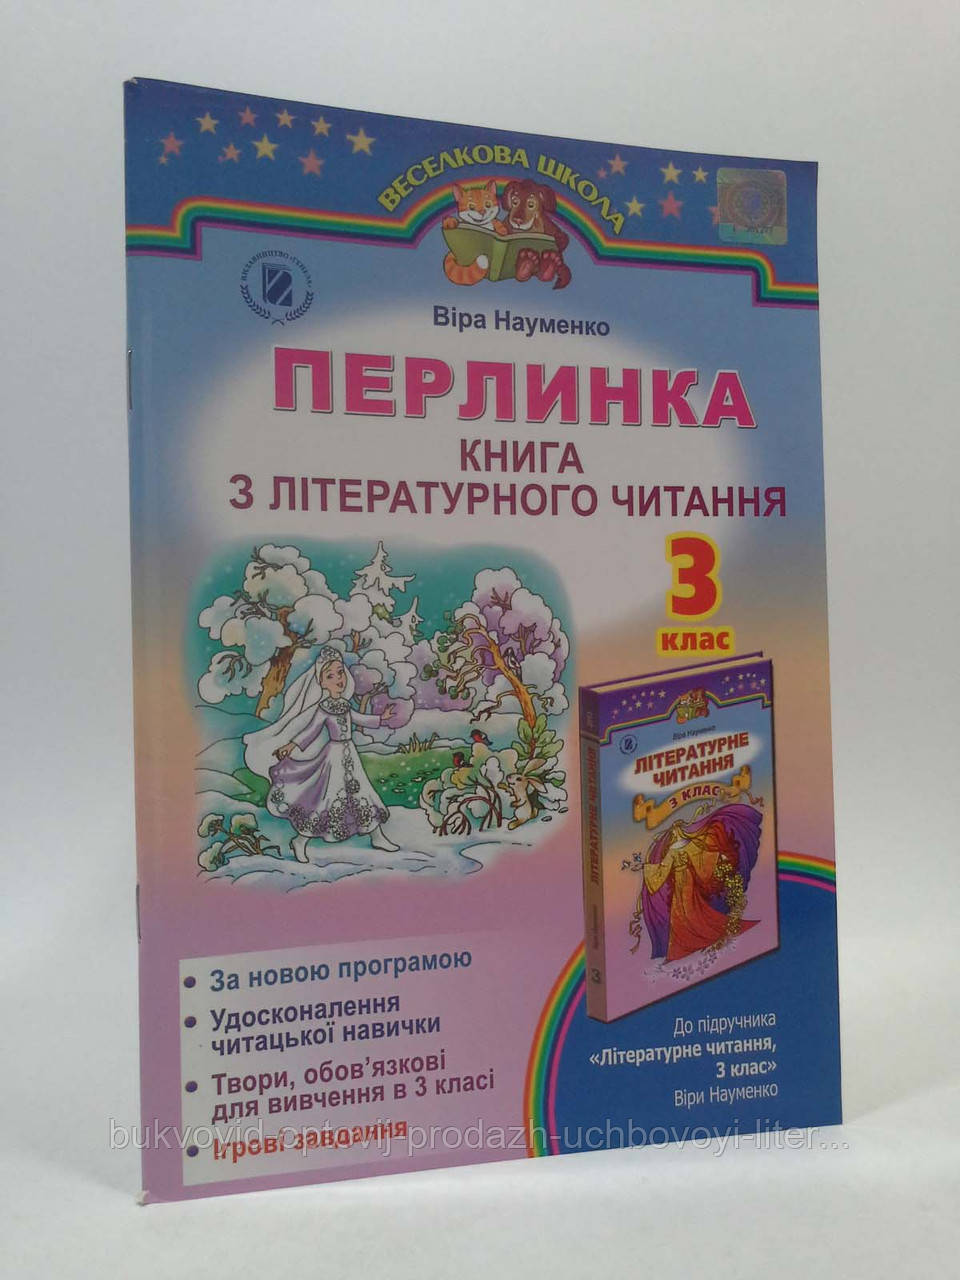 Науменко В. О. ISBN 978-966-11-0817-1 /Перлинка, 3 кл., Книга з літературного читання (2017)